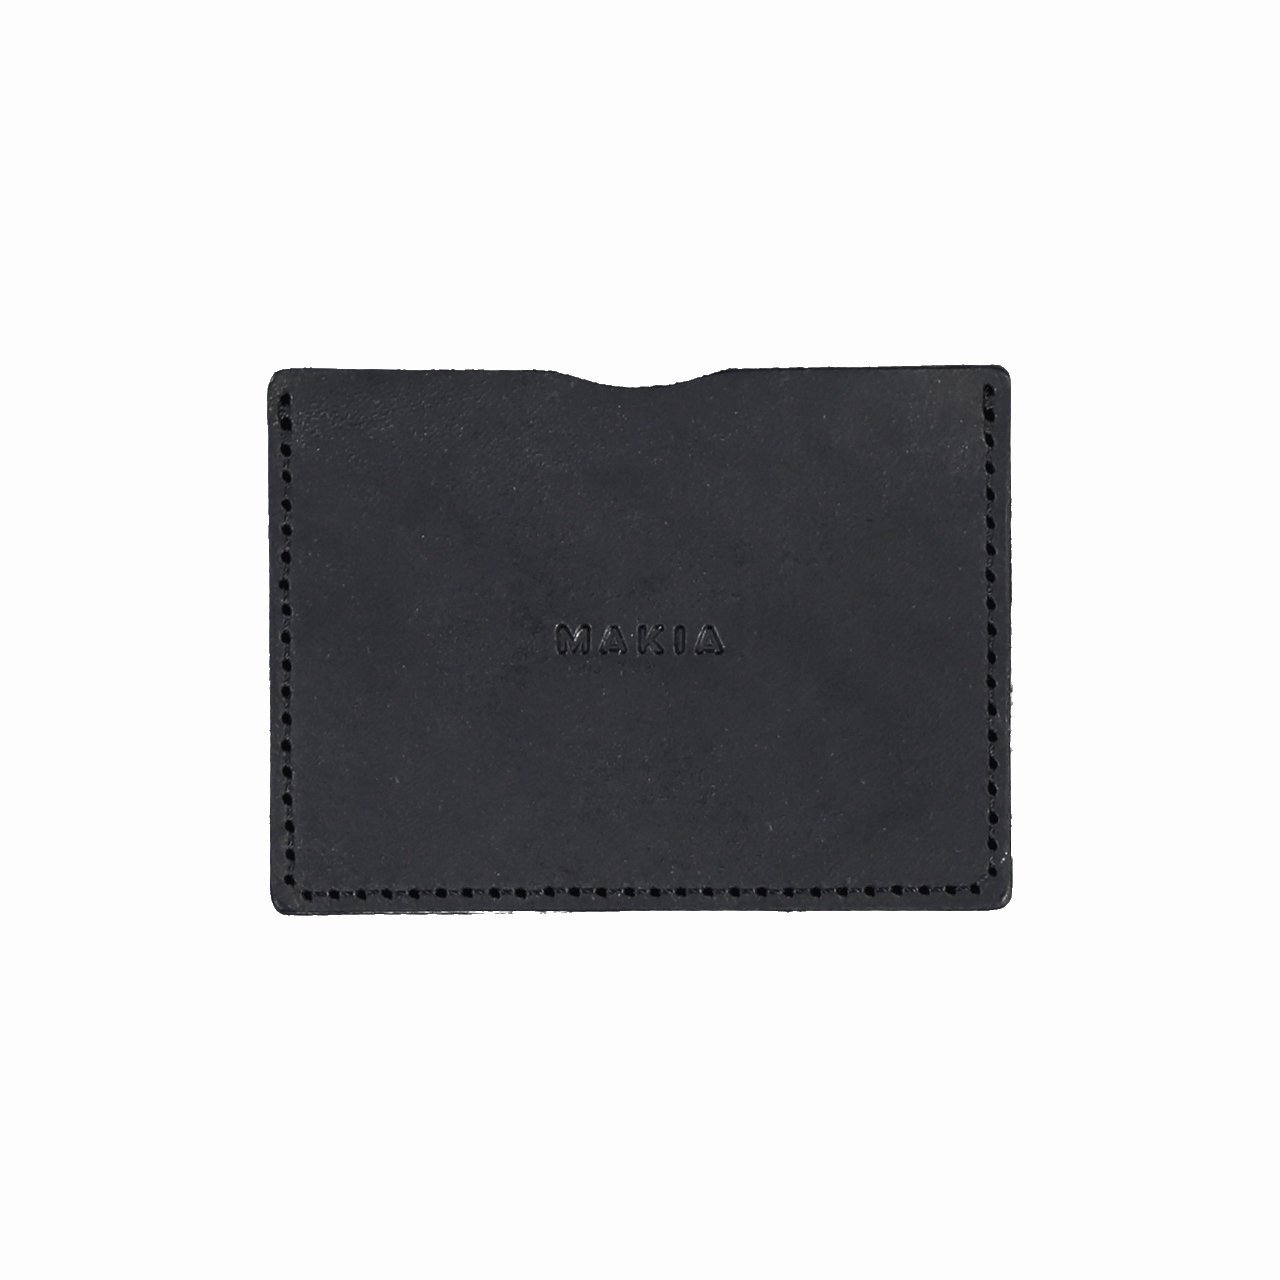 Černé pouzdro na karty Mark